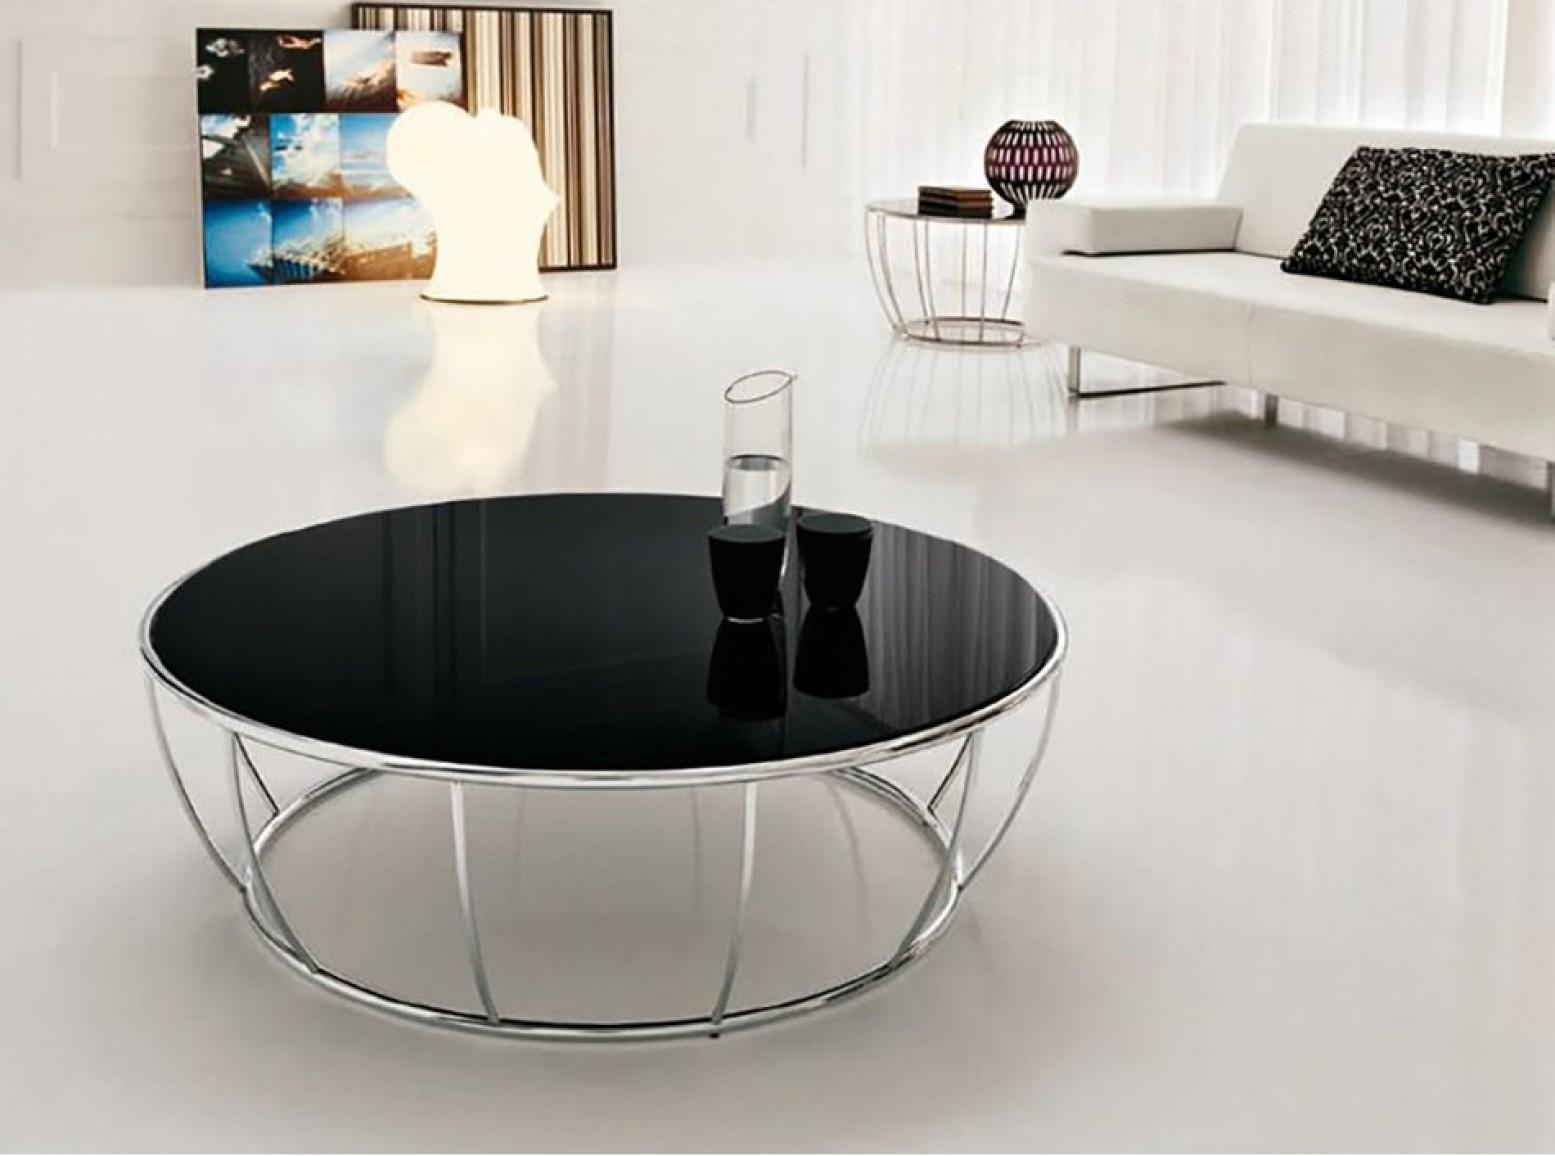 Amburgo Large Coffee Table Chromed Metal Base Black Glass Top